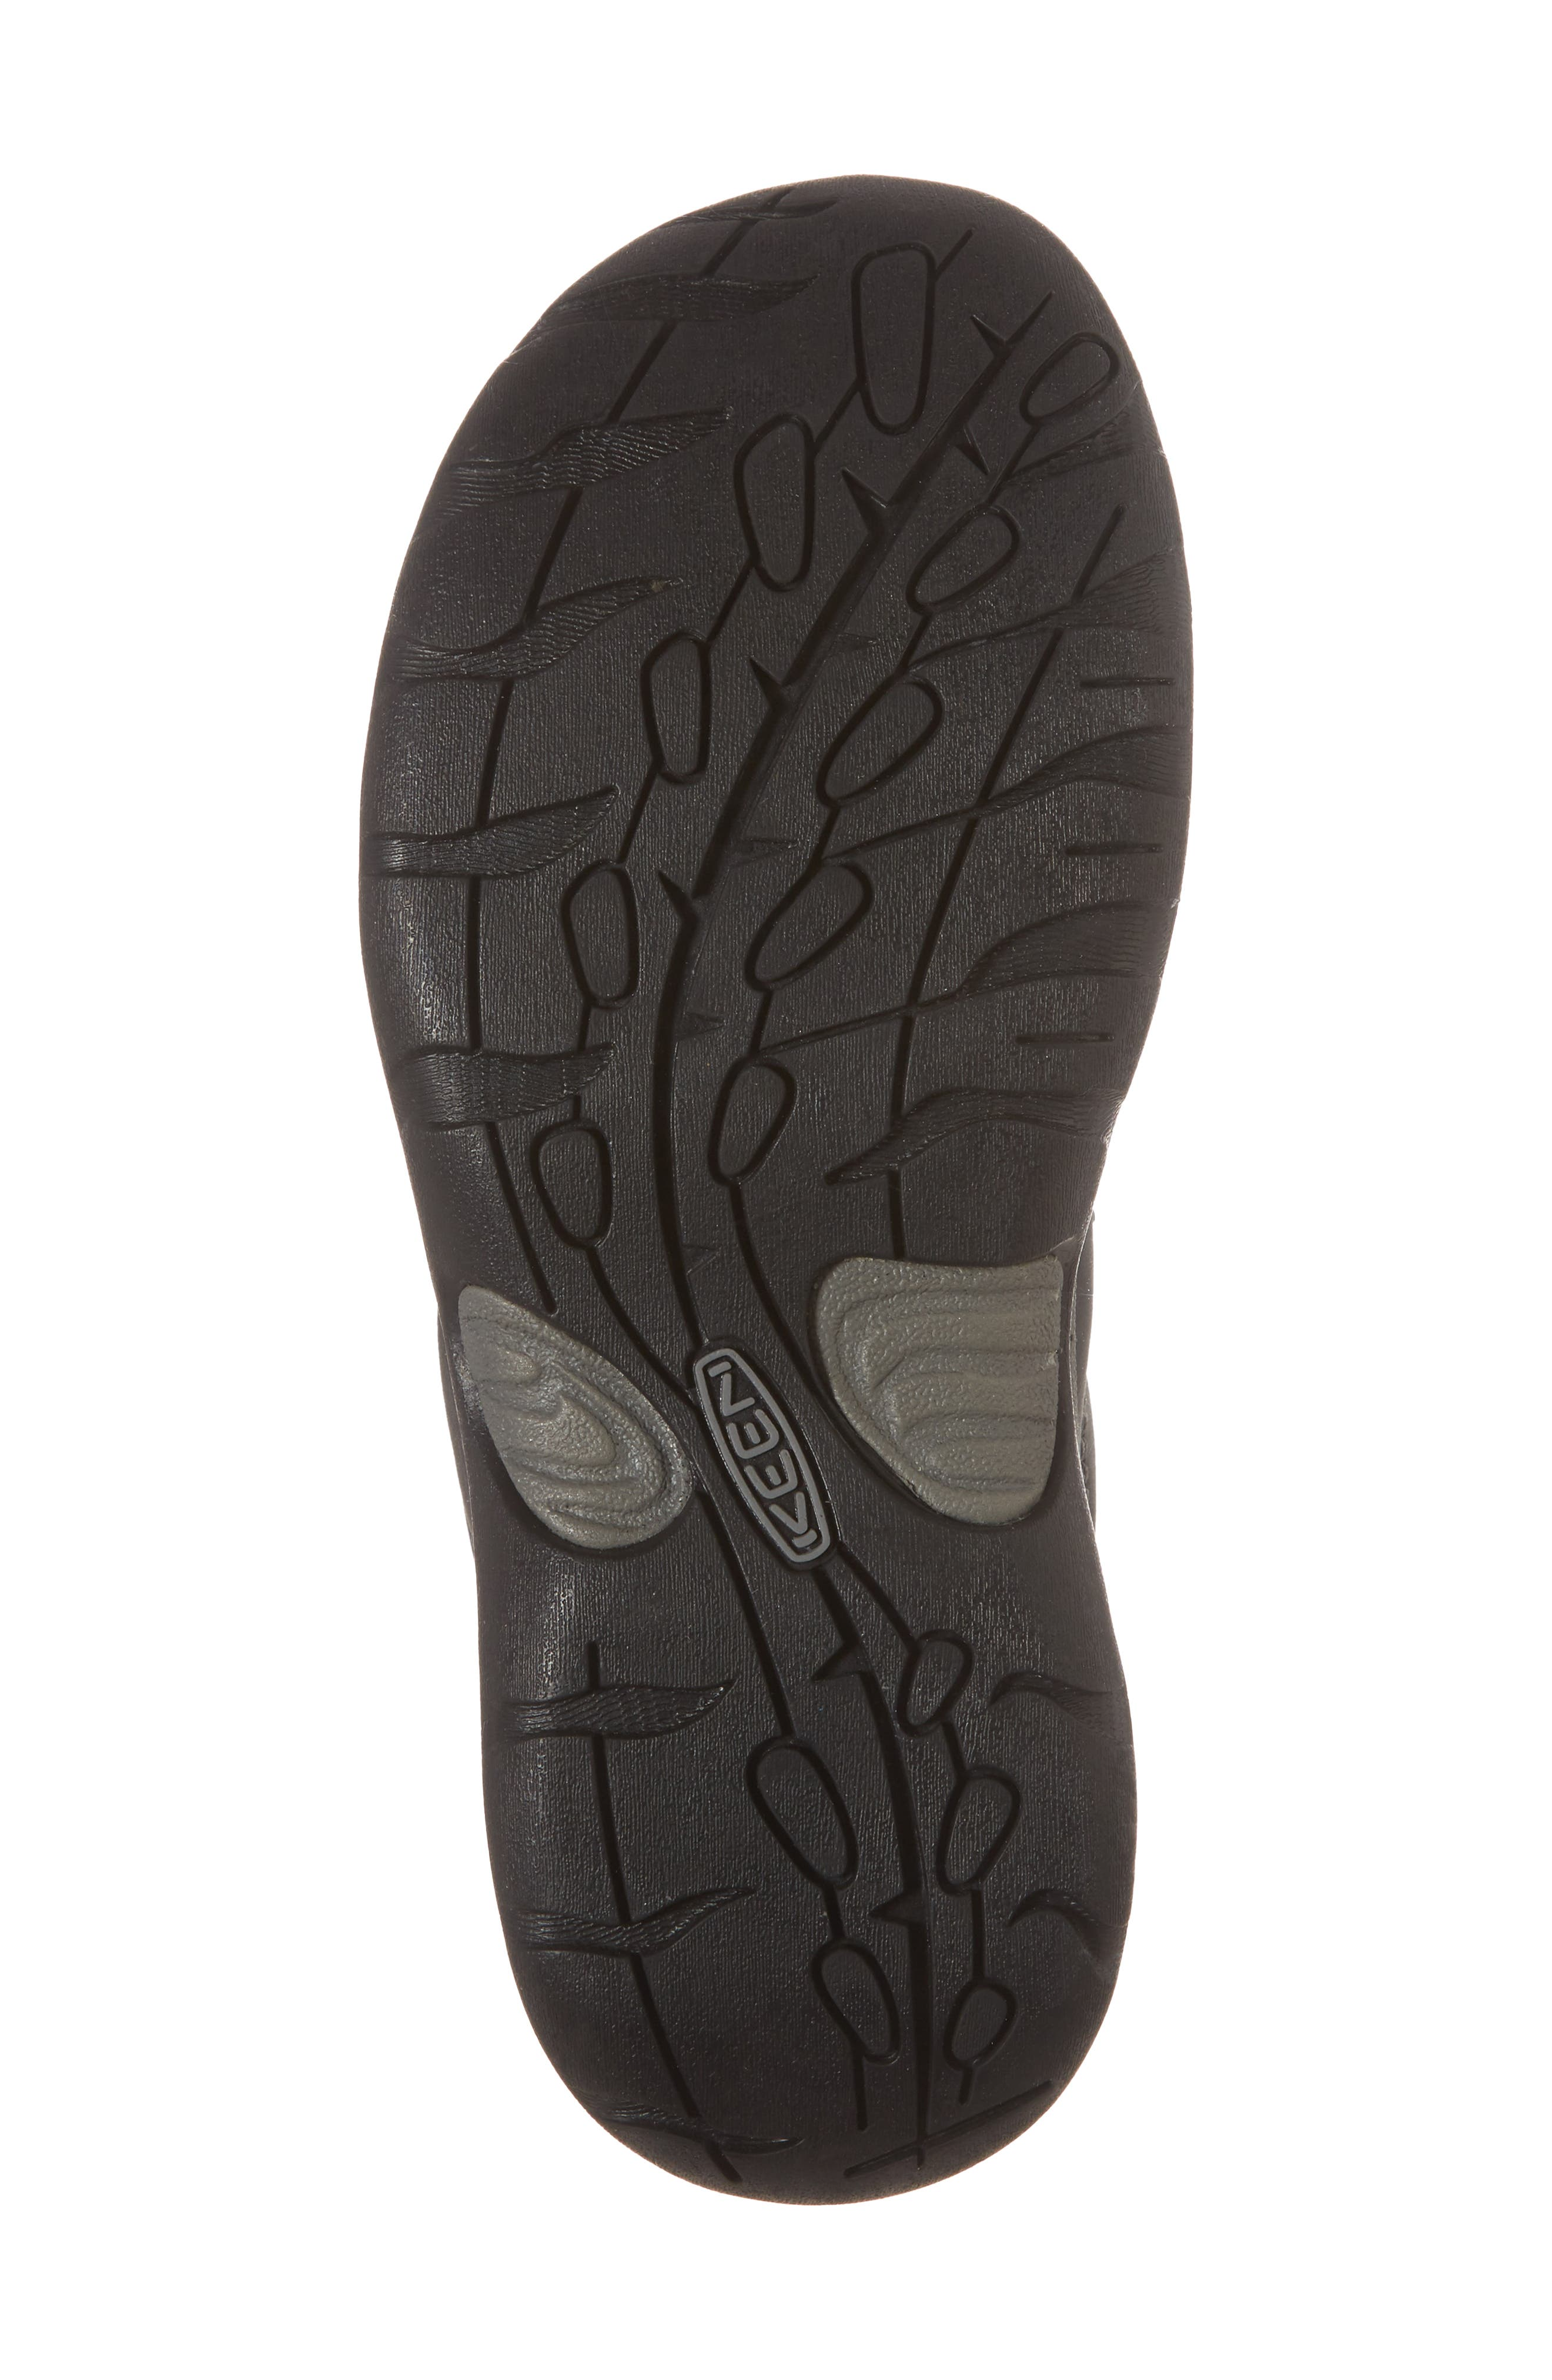 Presidio II Sneaker,                             Alternate thumbnail 6, color,                             BLACK/ STEEL GREY LEATHER